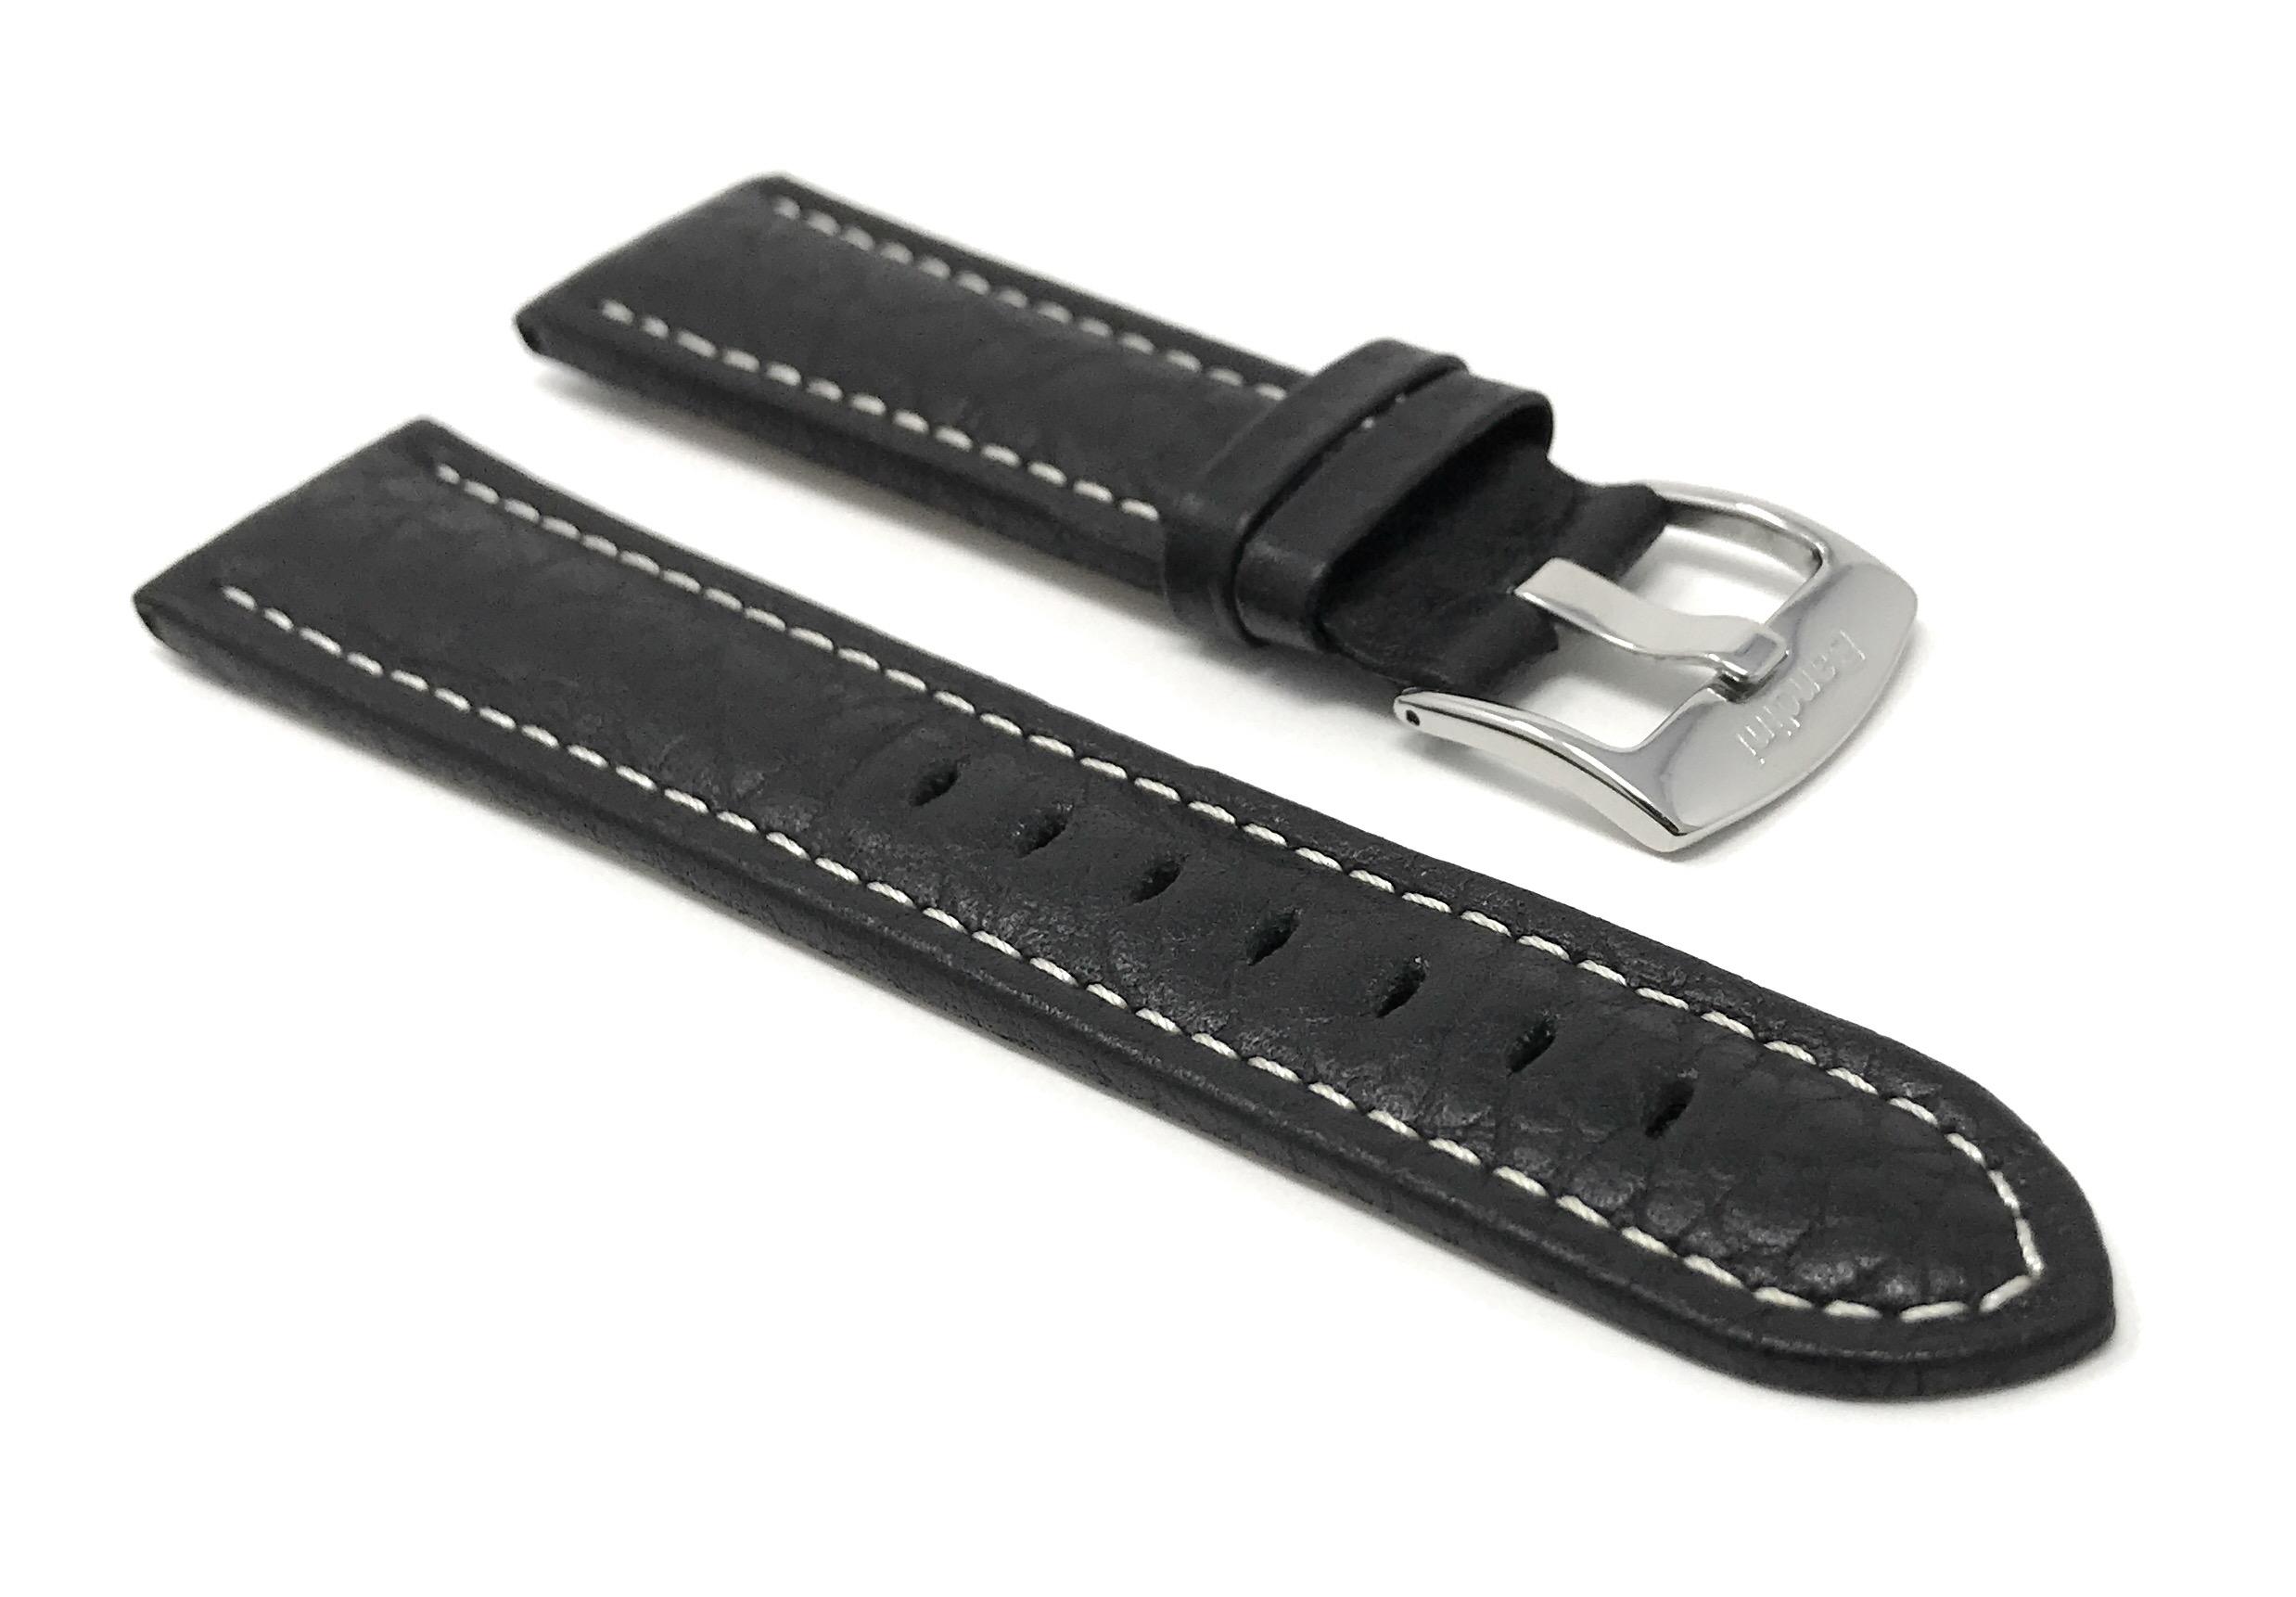 Bandini-Watch-Band-Leather-Strap-Buffalo-Pattern-18mm-30mm-Extra-Long-Also thumbnail 11